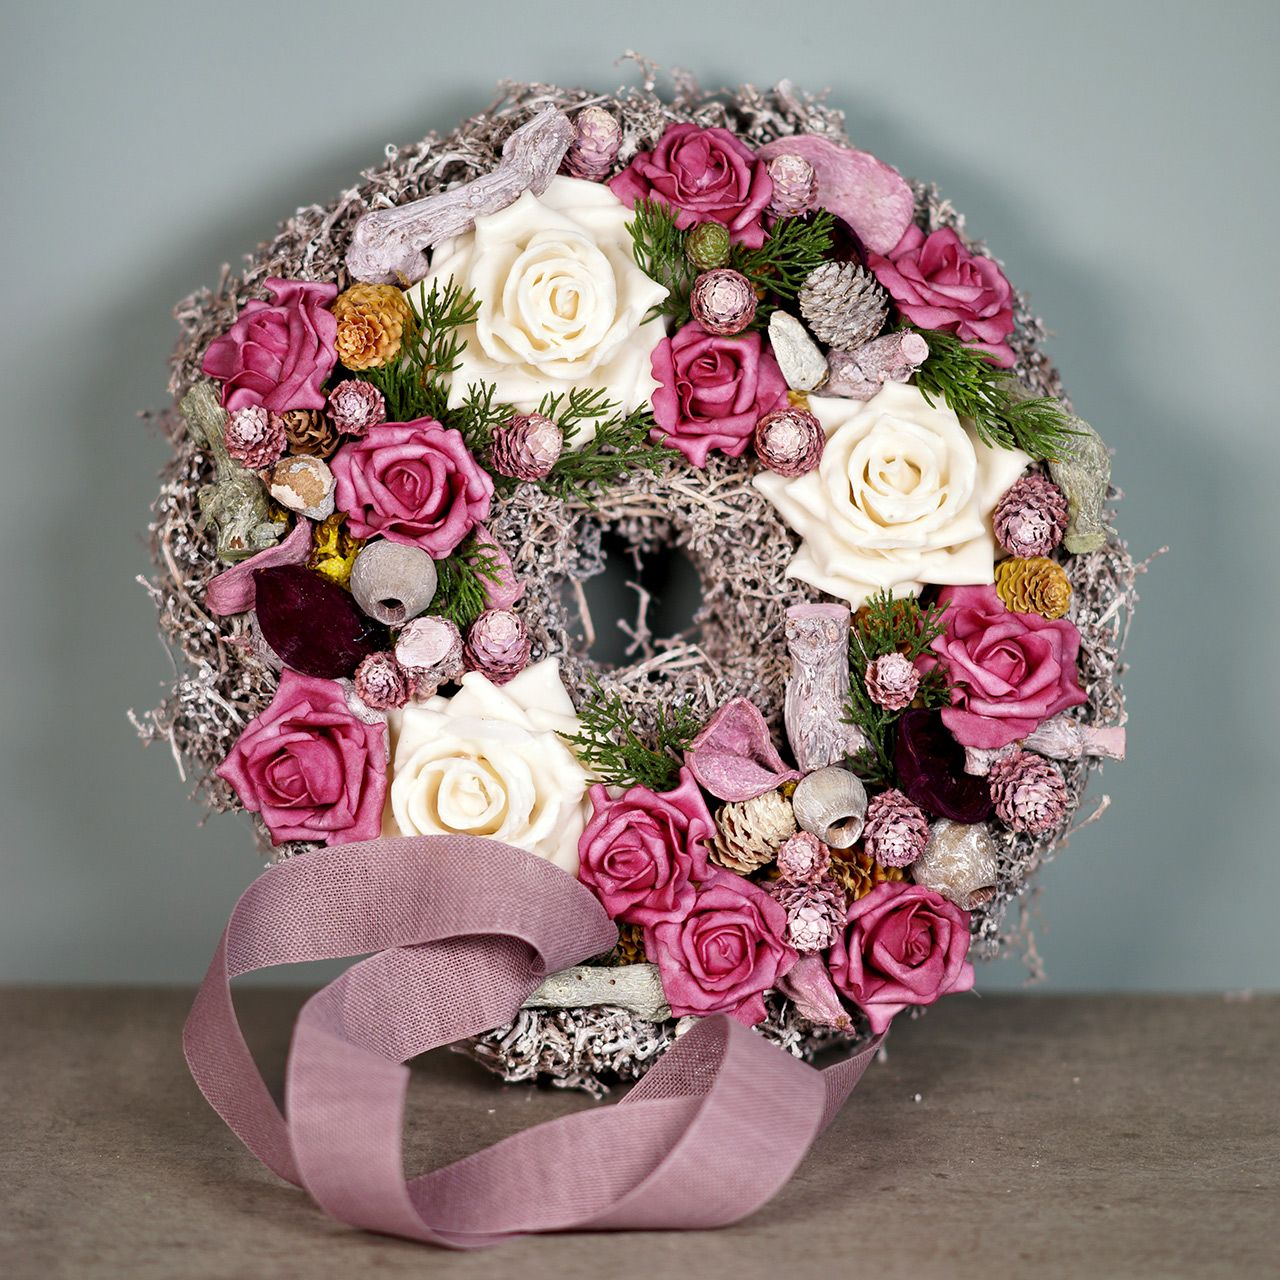 Espuma de espuma de rosa color rosa Ø15cm 4 piezas